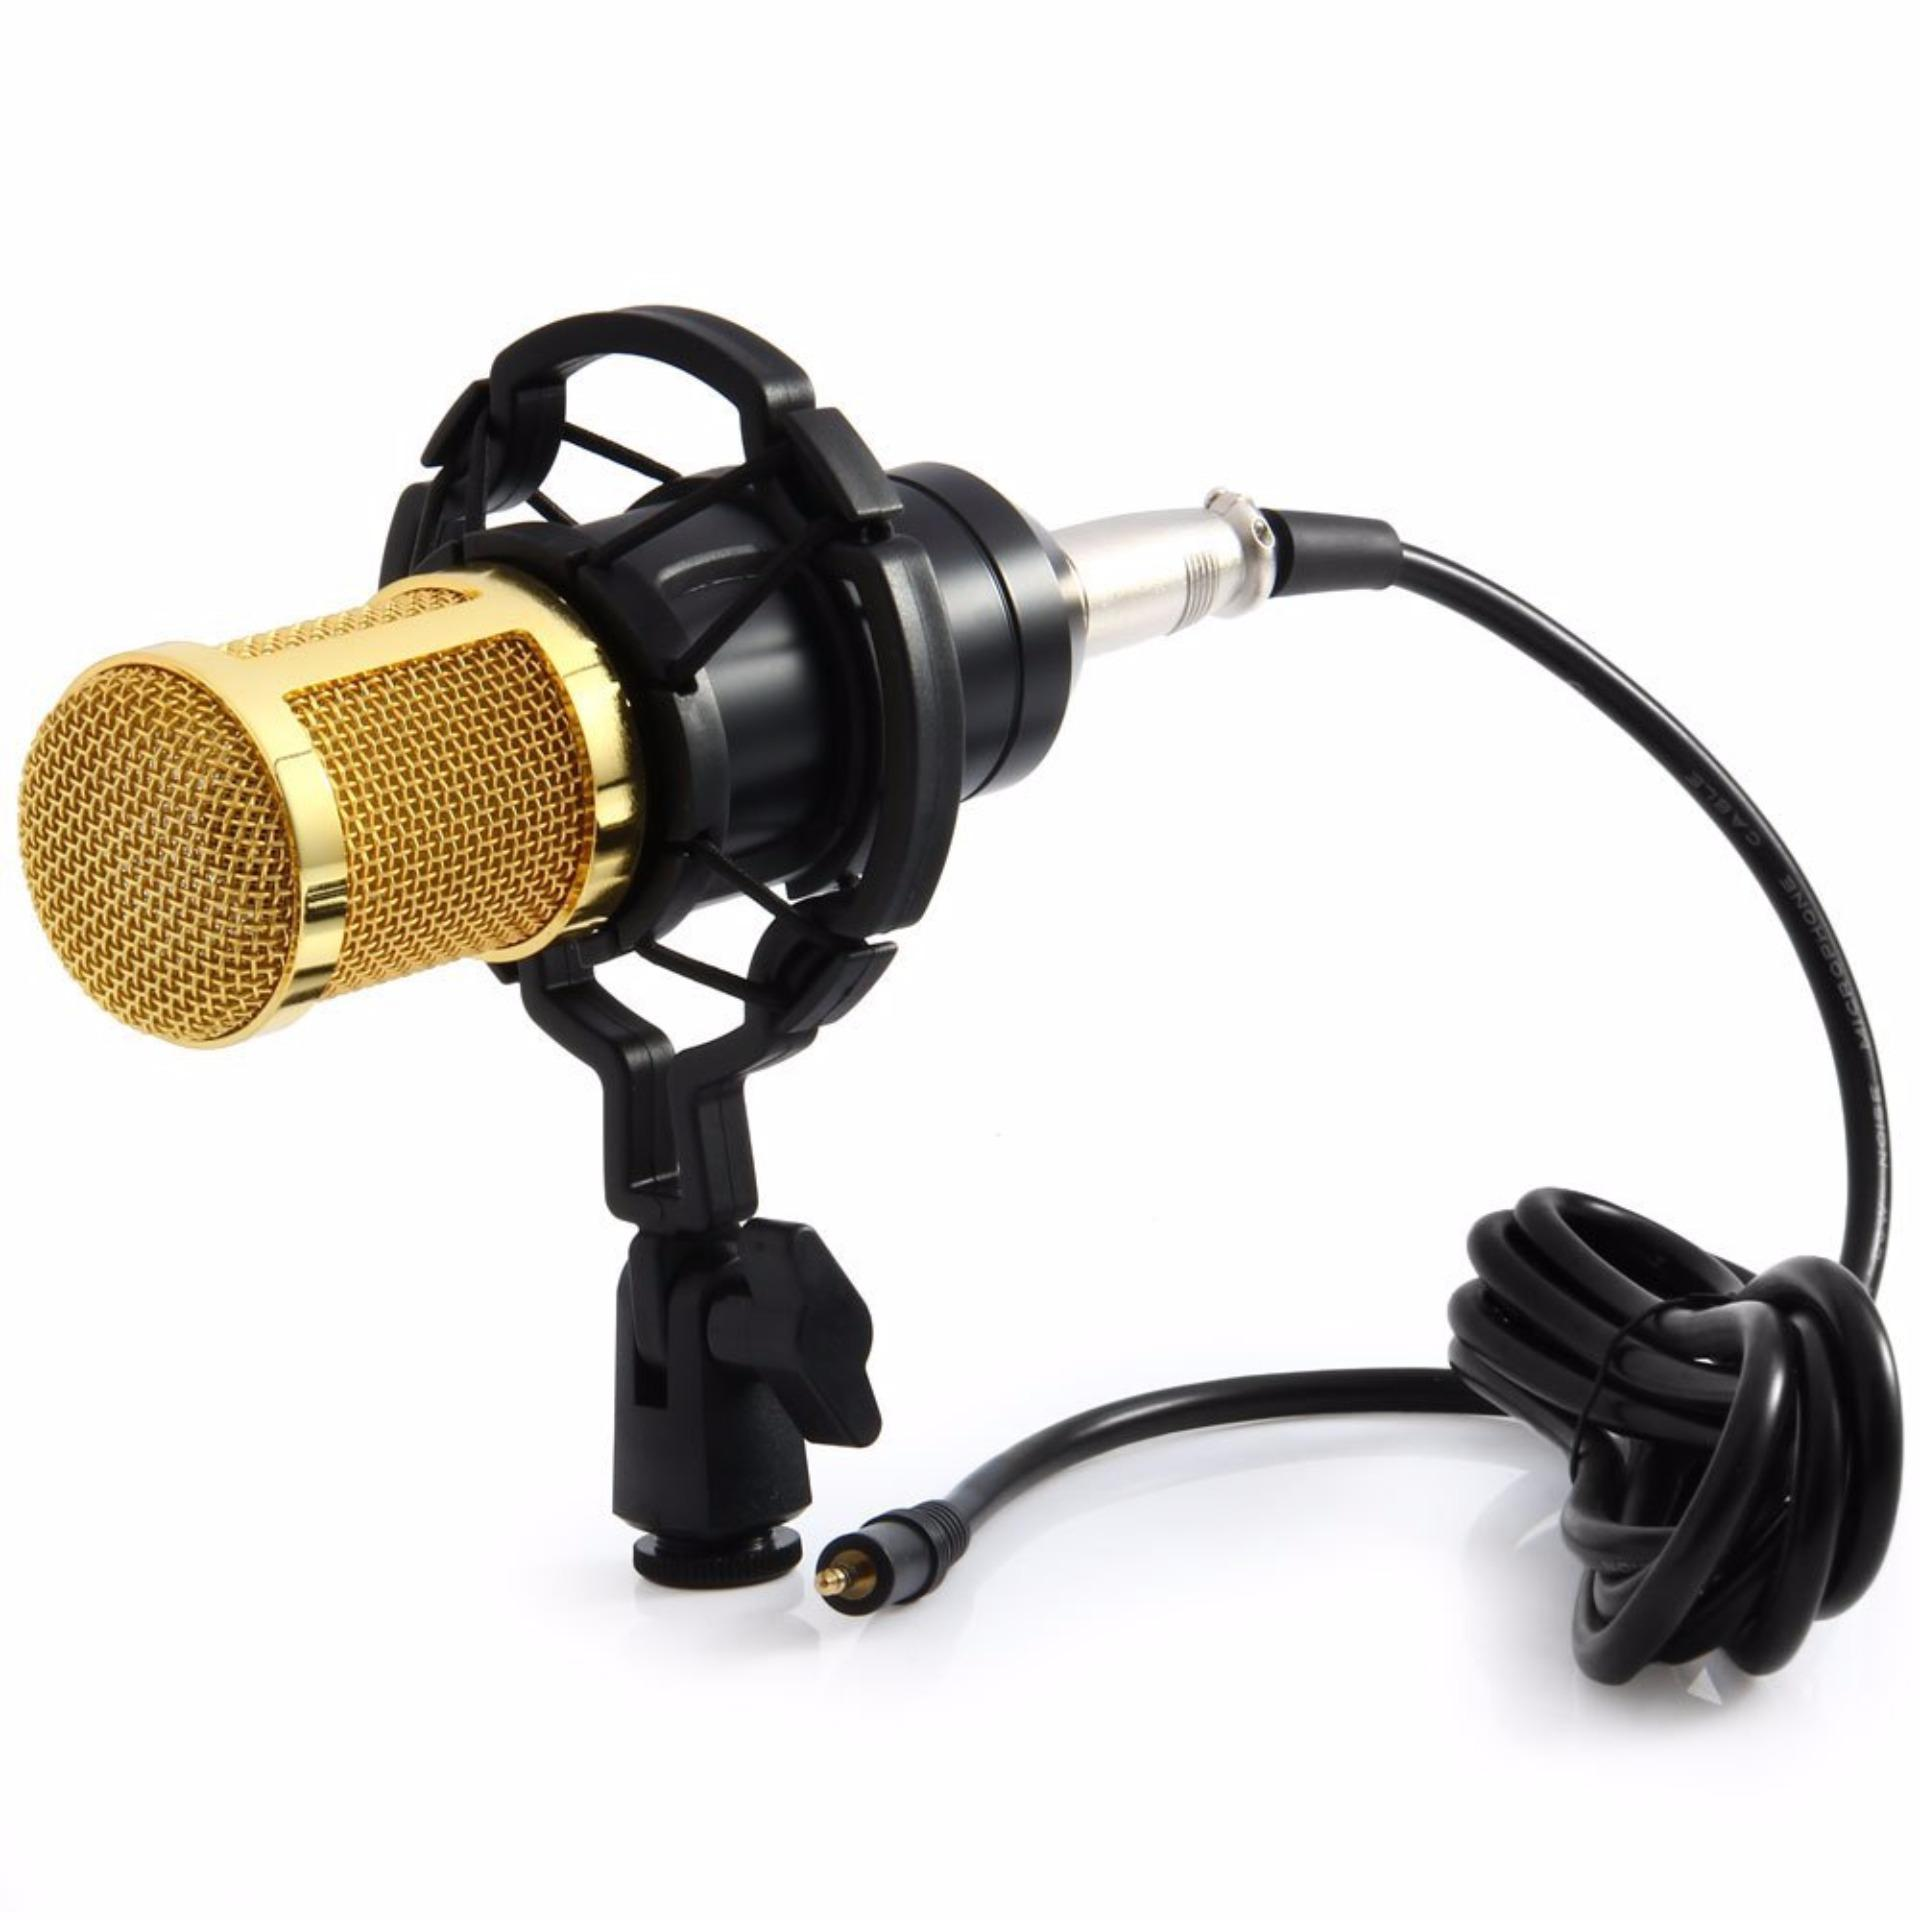 Taffware Mikrofon Kondenser Studio Dengan Shock Proof Mount Bm800 Black Original